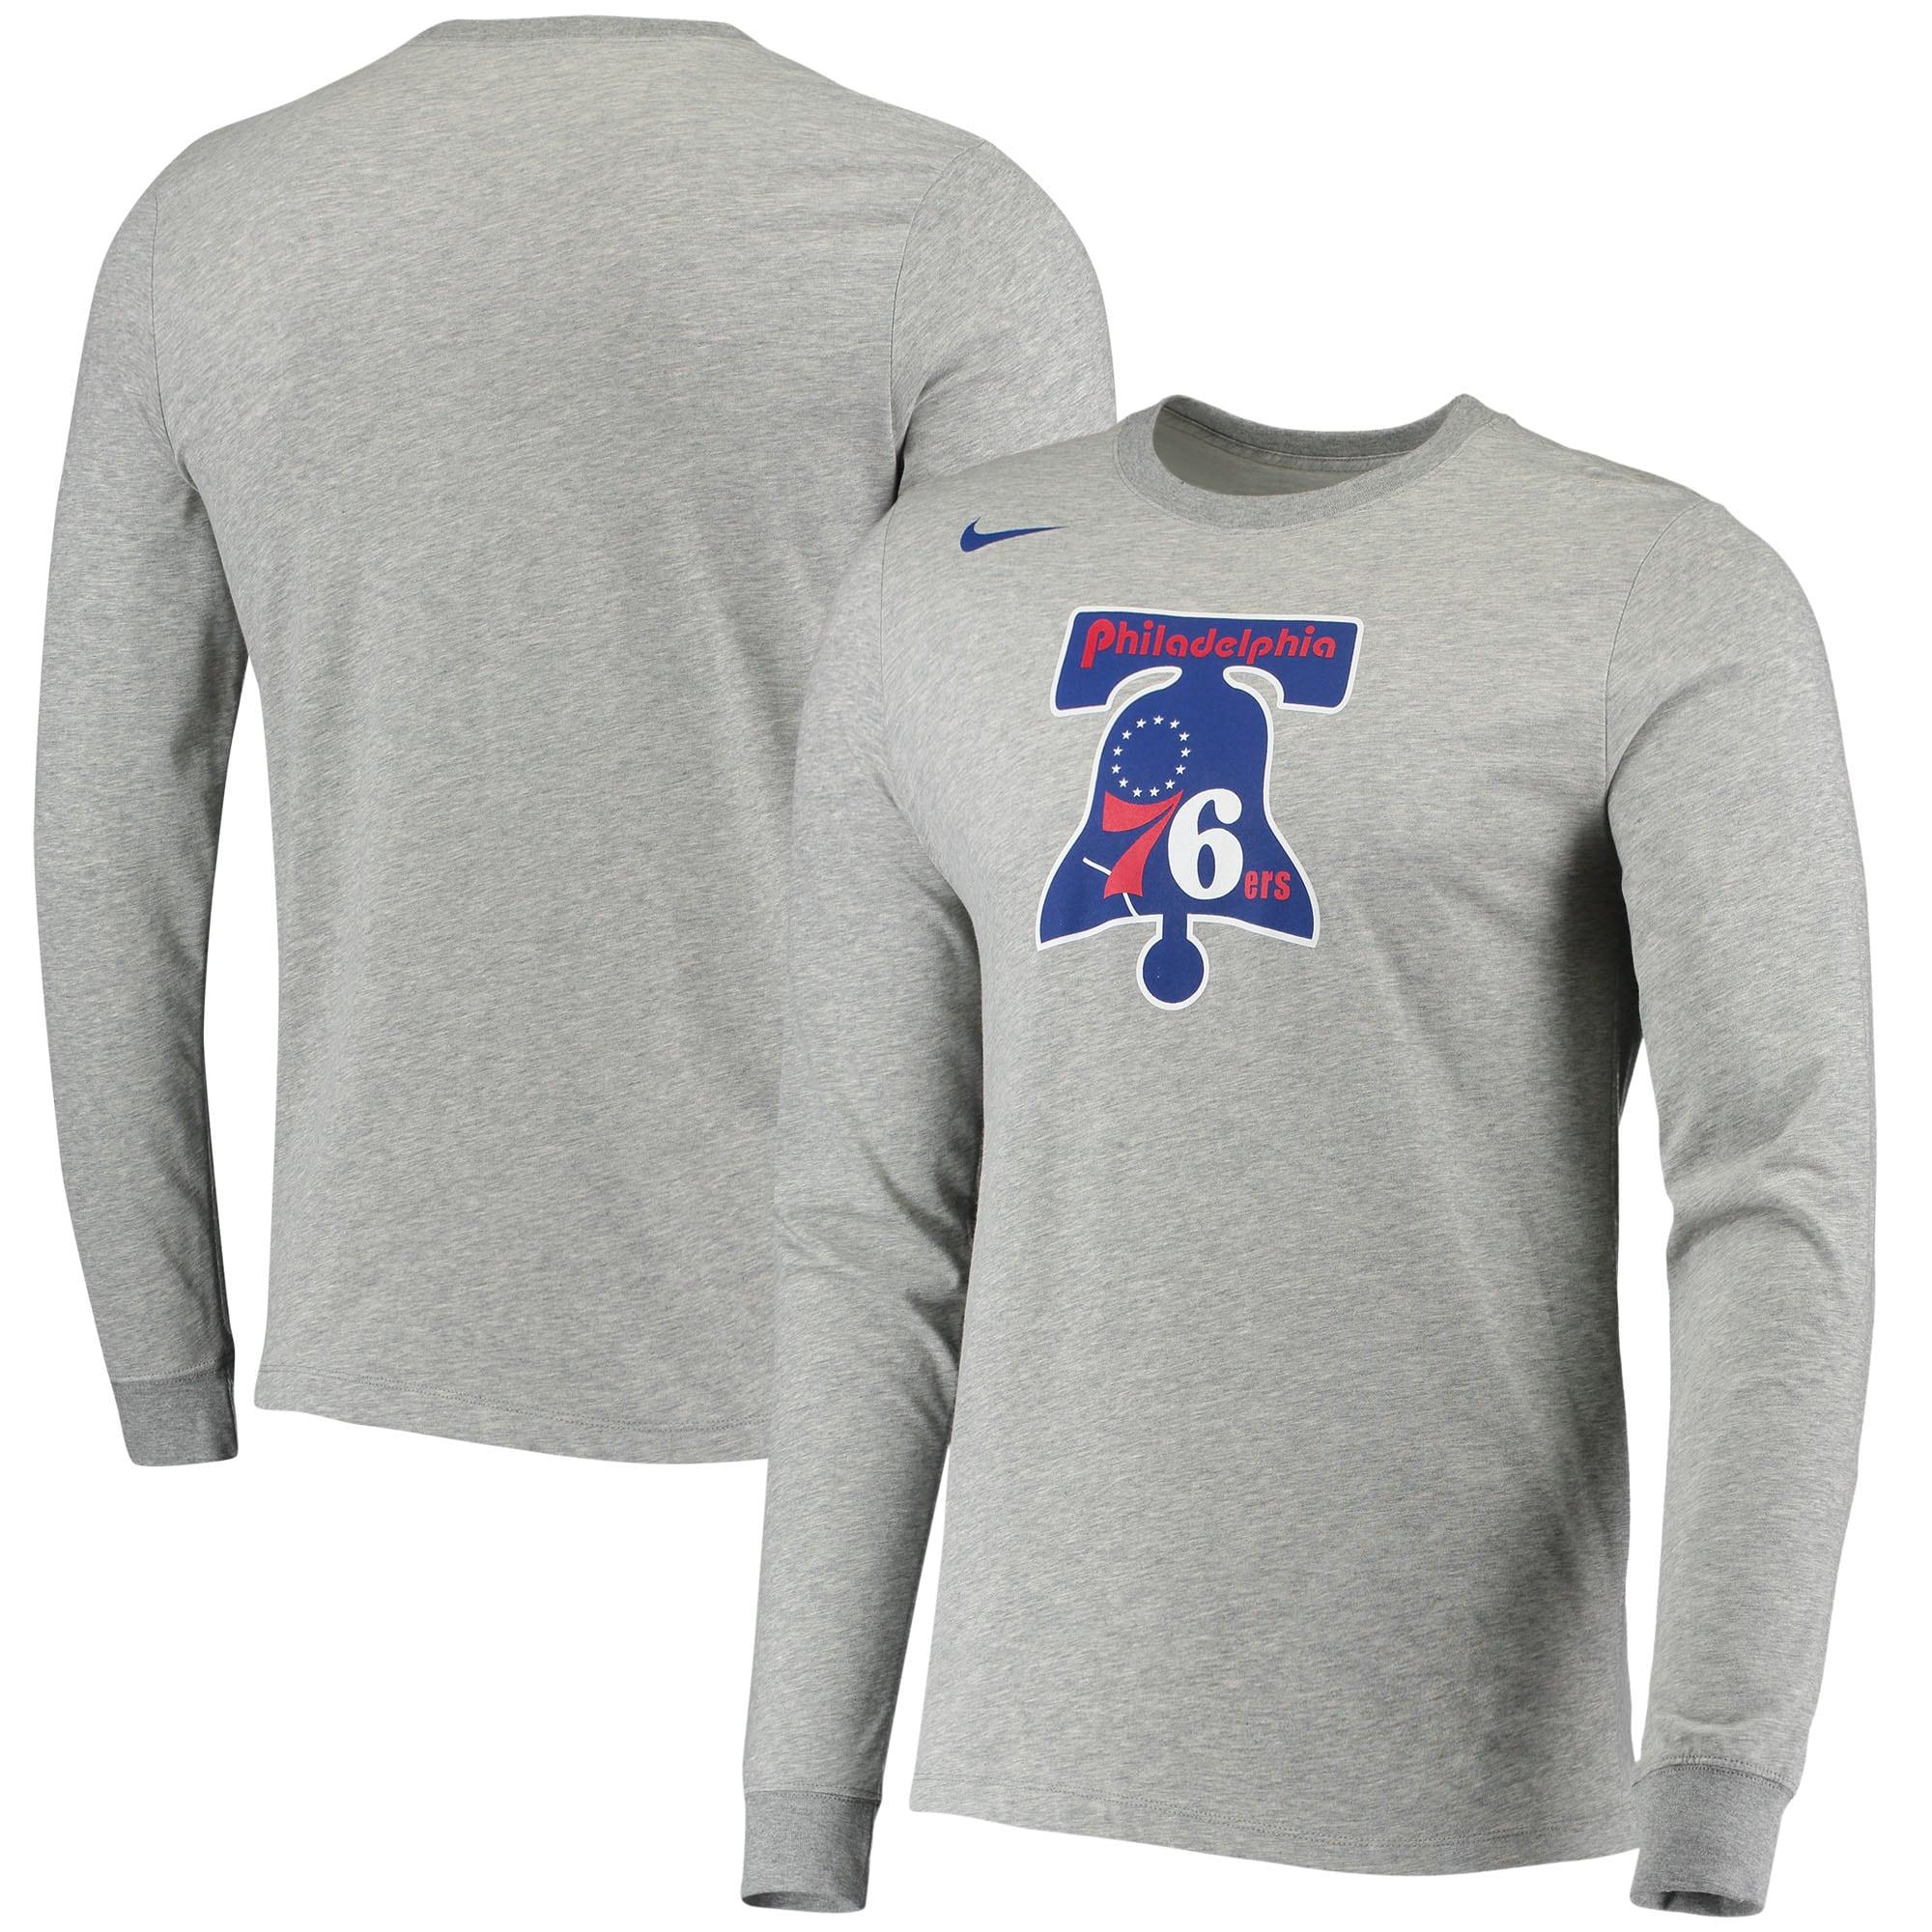 Philadelphia 76ers Nike Hardwood Classics Performance Long Sleeve T-Shirt - Heathered Gray